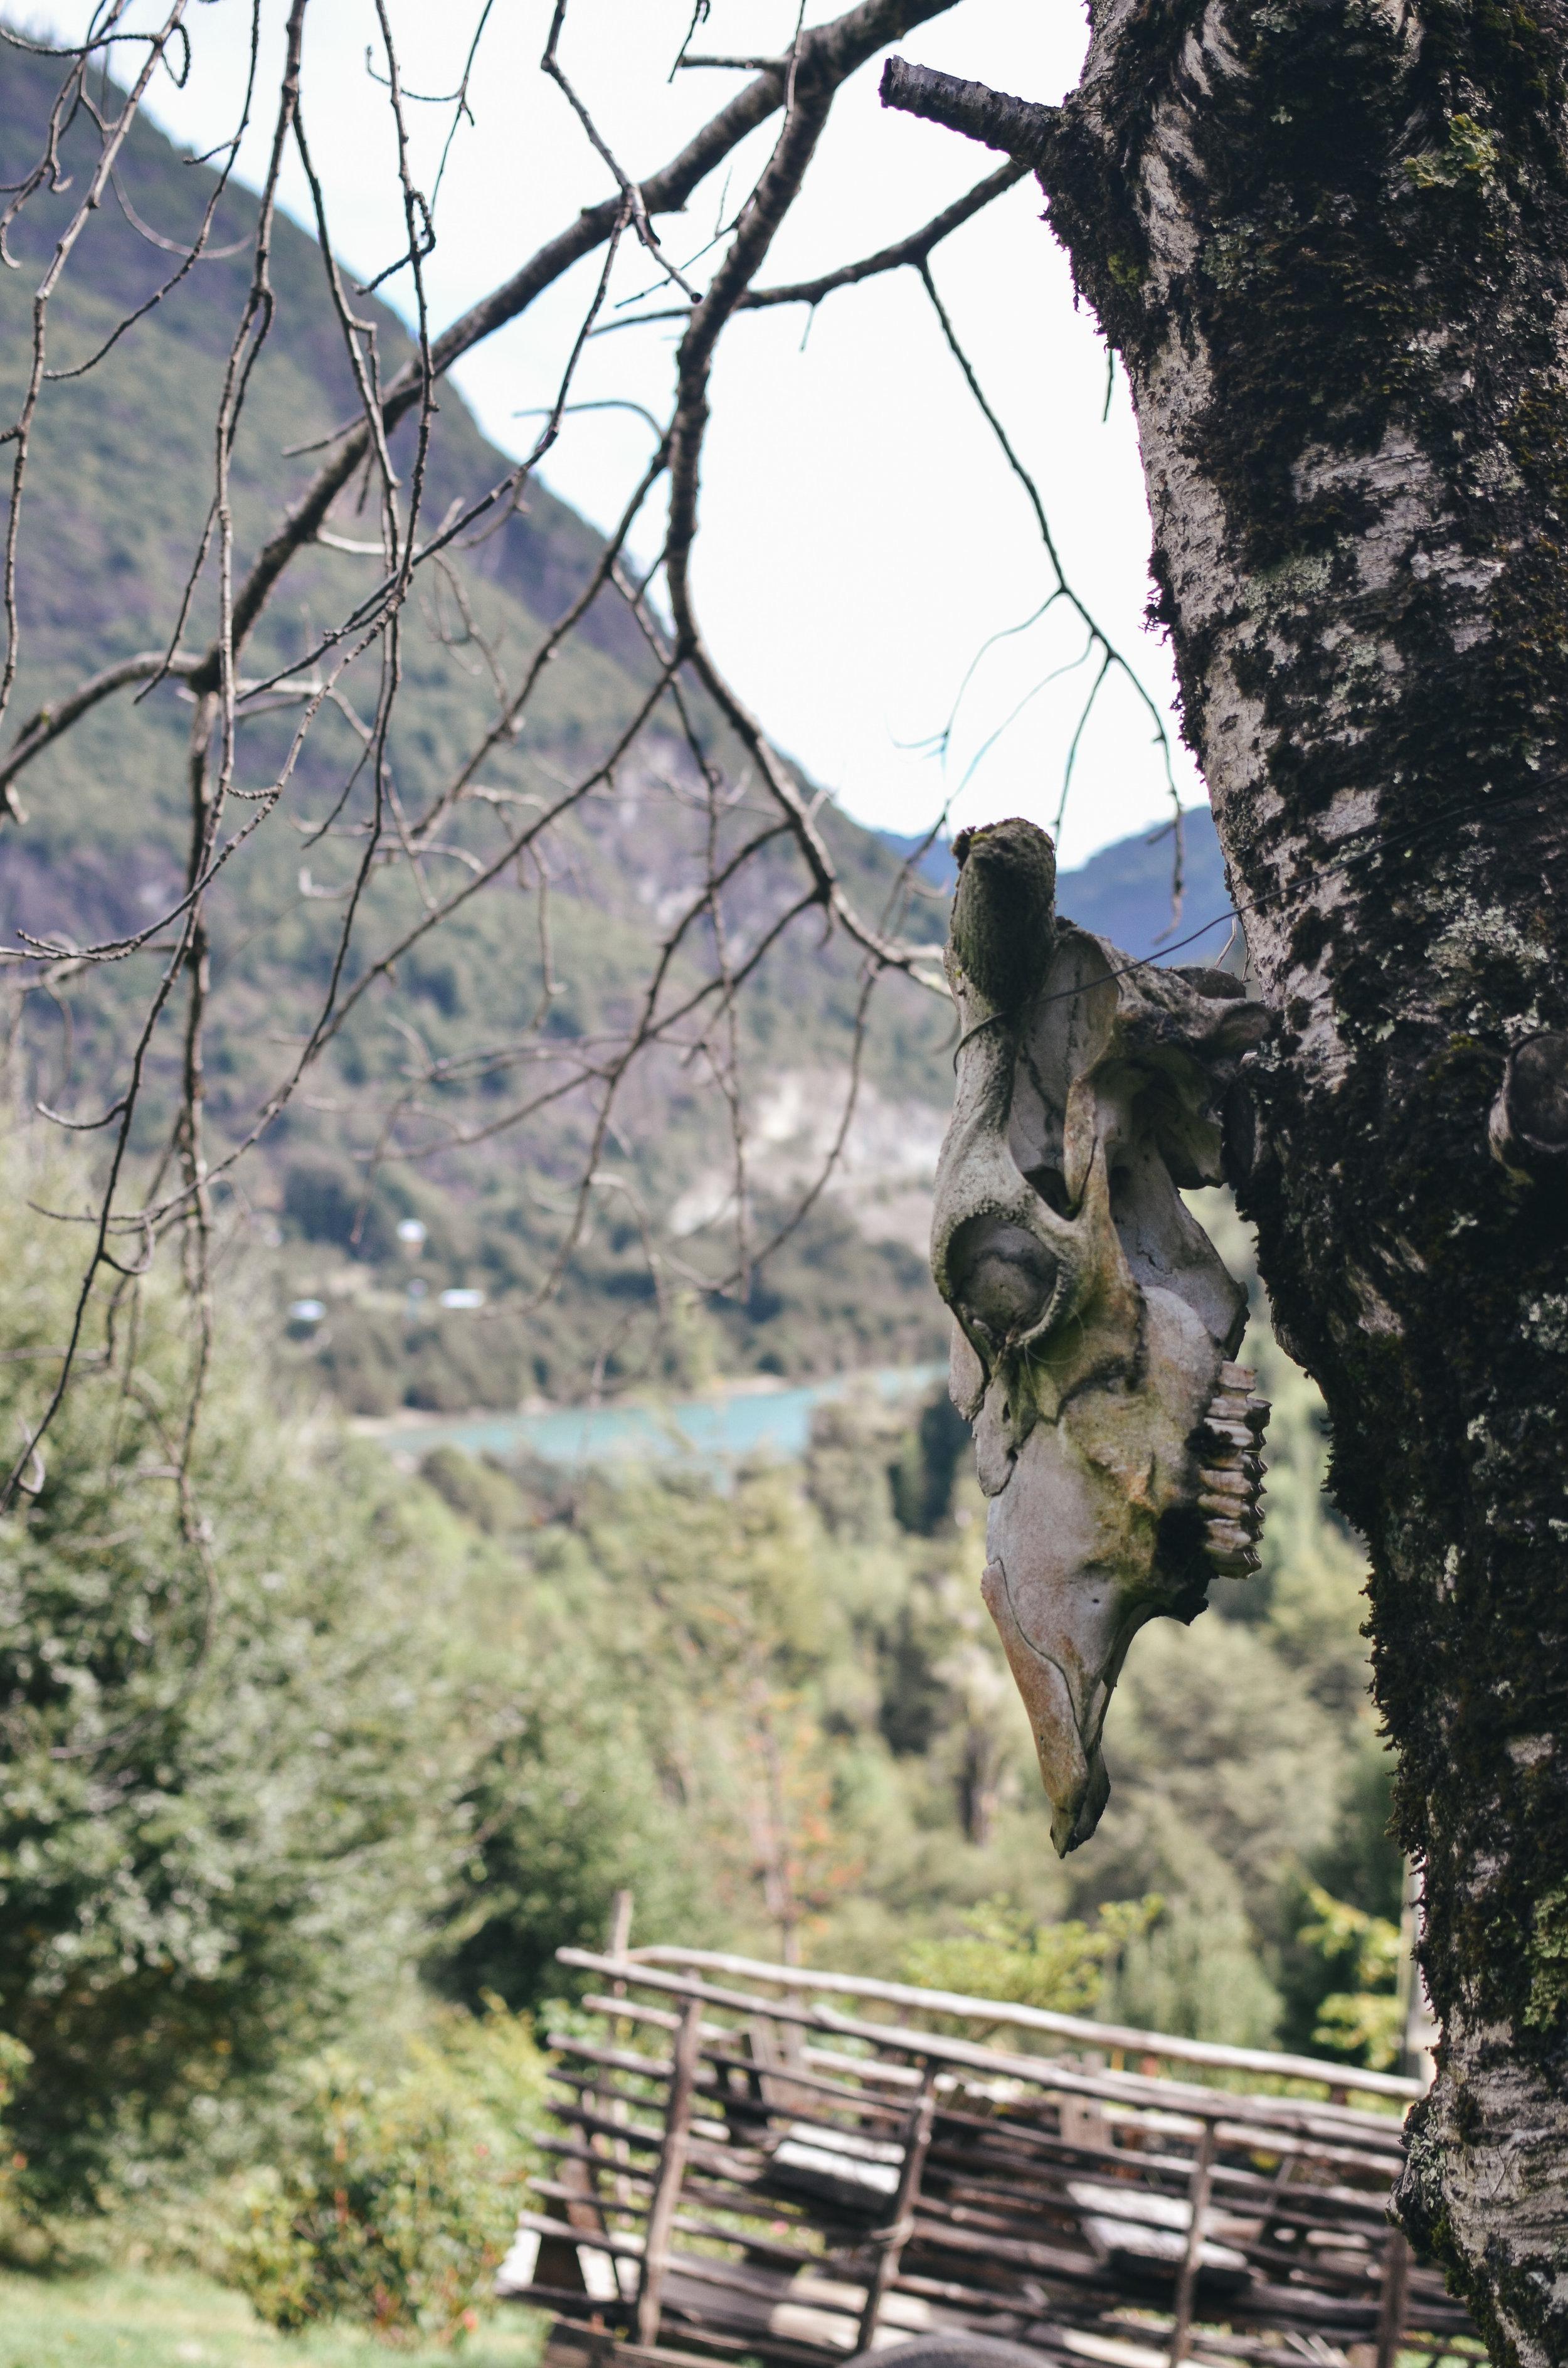 barraco+lodge+chile+life+on+pine+travel+blog+life+on+pine_DSC_0546.jpg